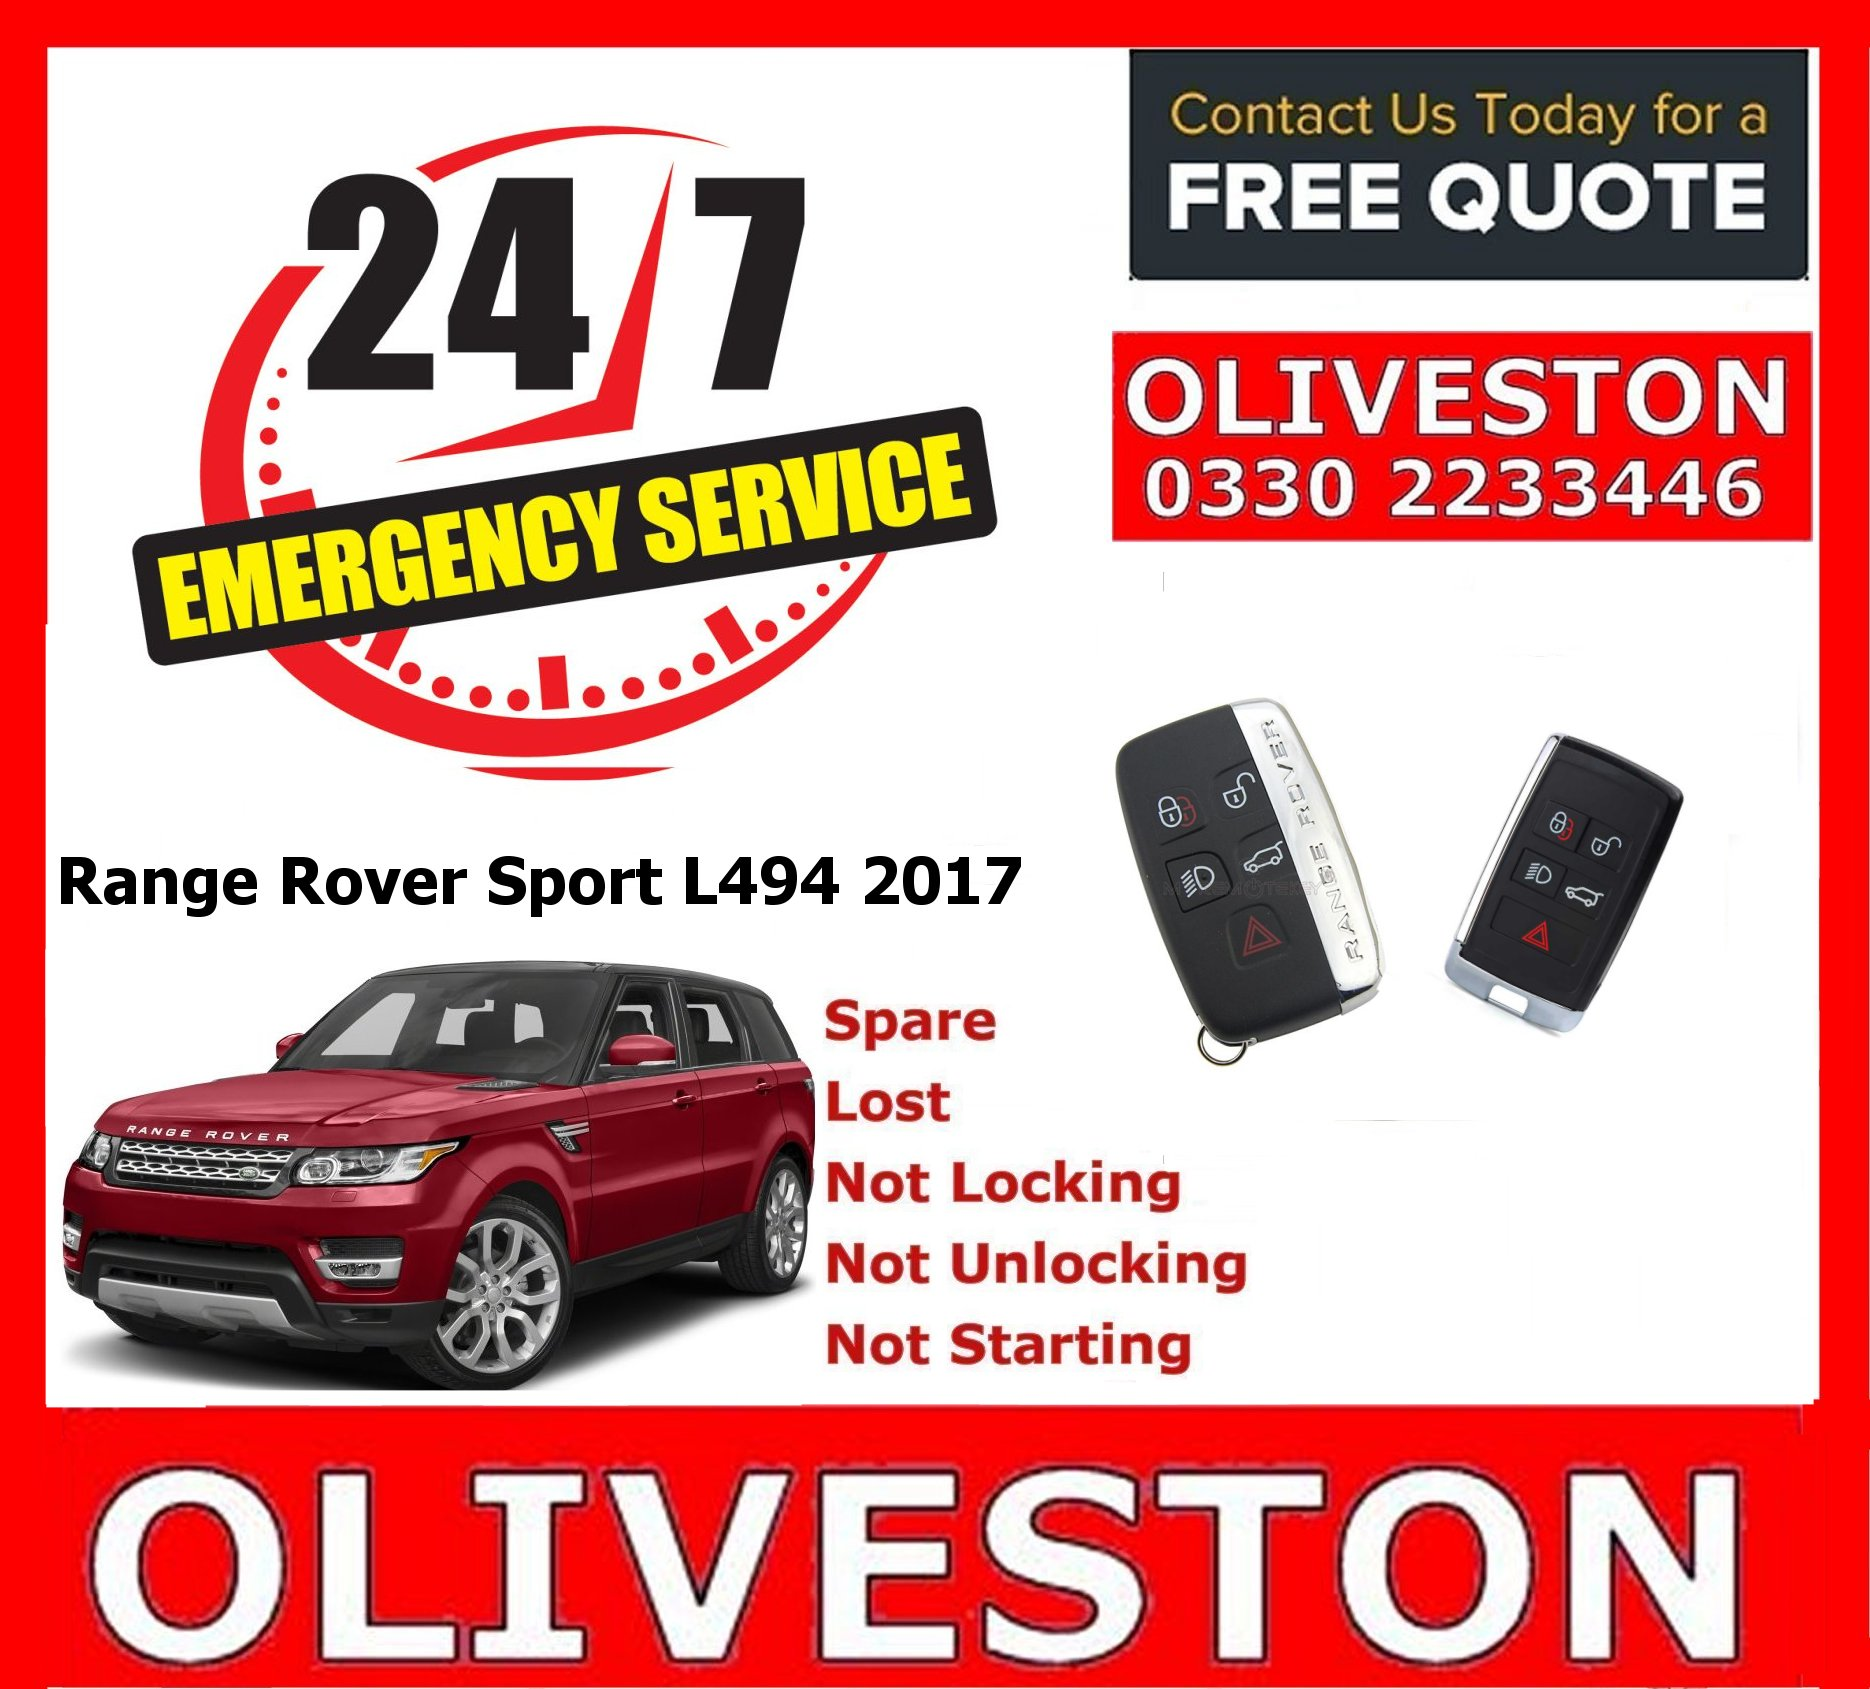 Range Rover Land Rover Jaguar Spare lost keys Milton Keynes High_Wycombe Aylesbury Bletchley Amersham Chesham Newport Pagnell Marlow Buckingham Beaconsfield Buckinghamshire South East